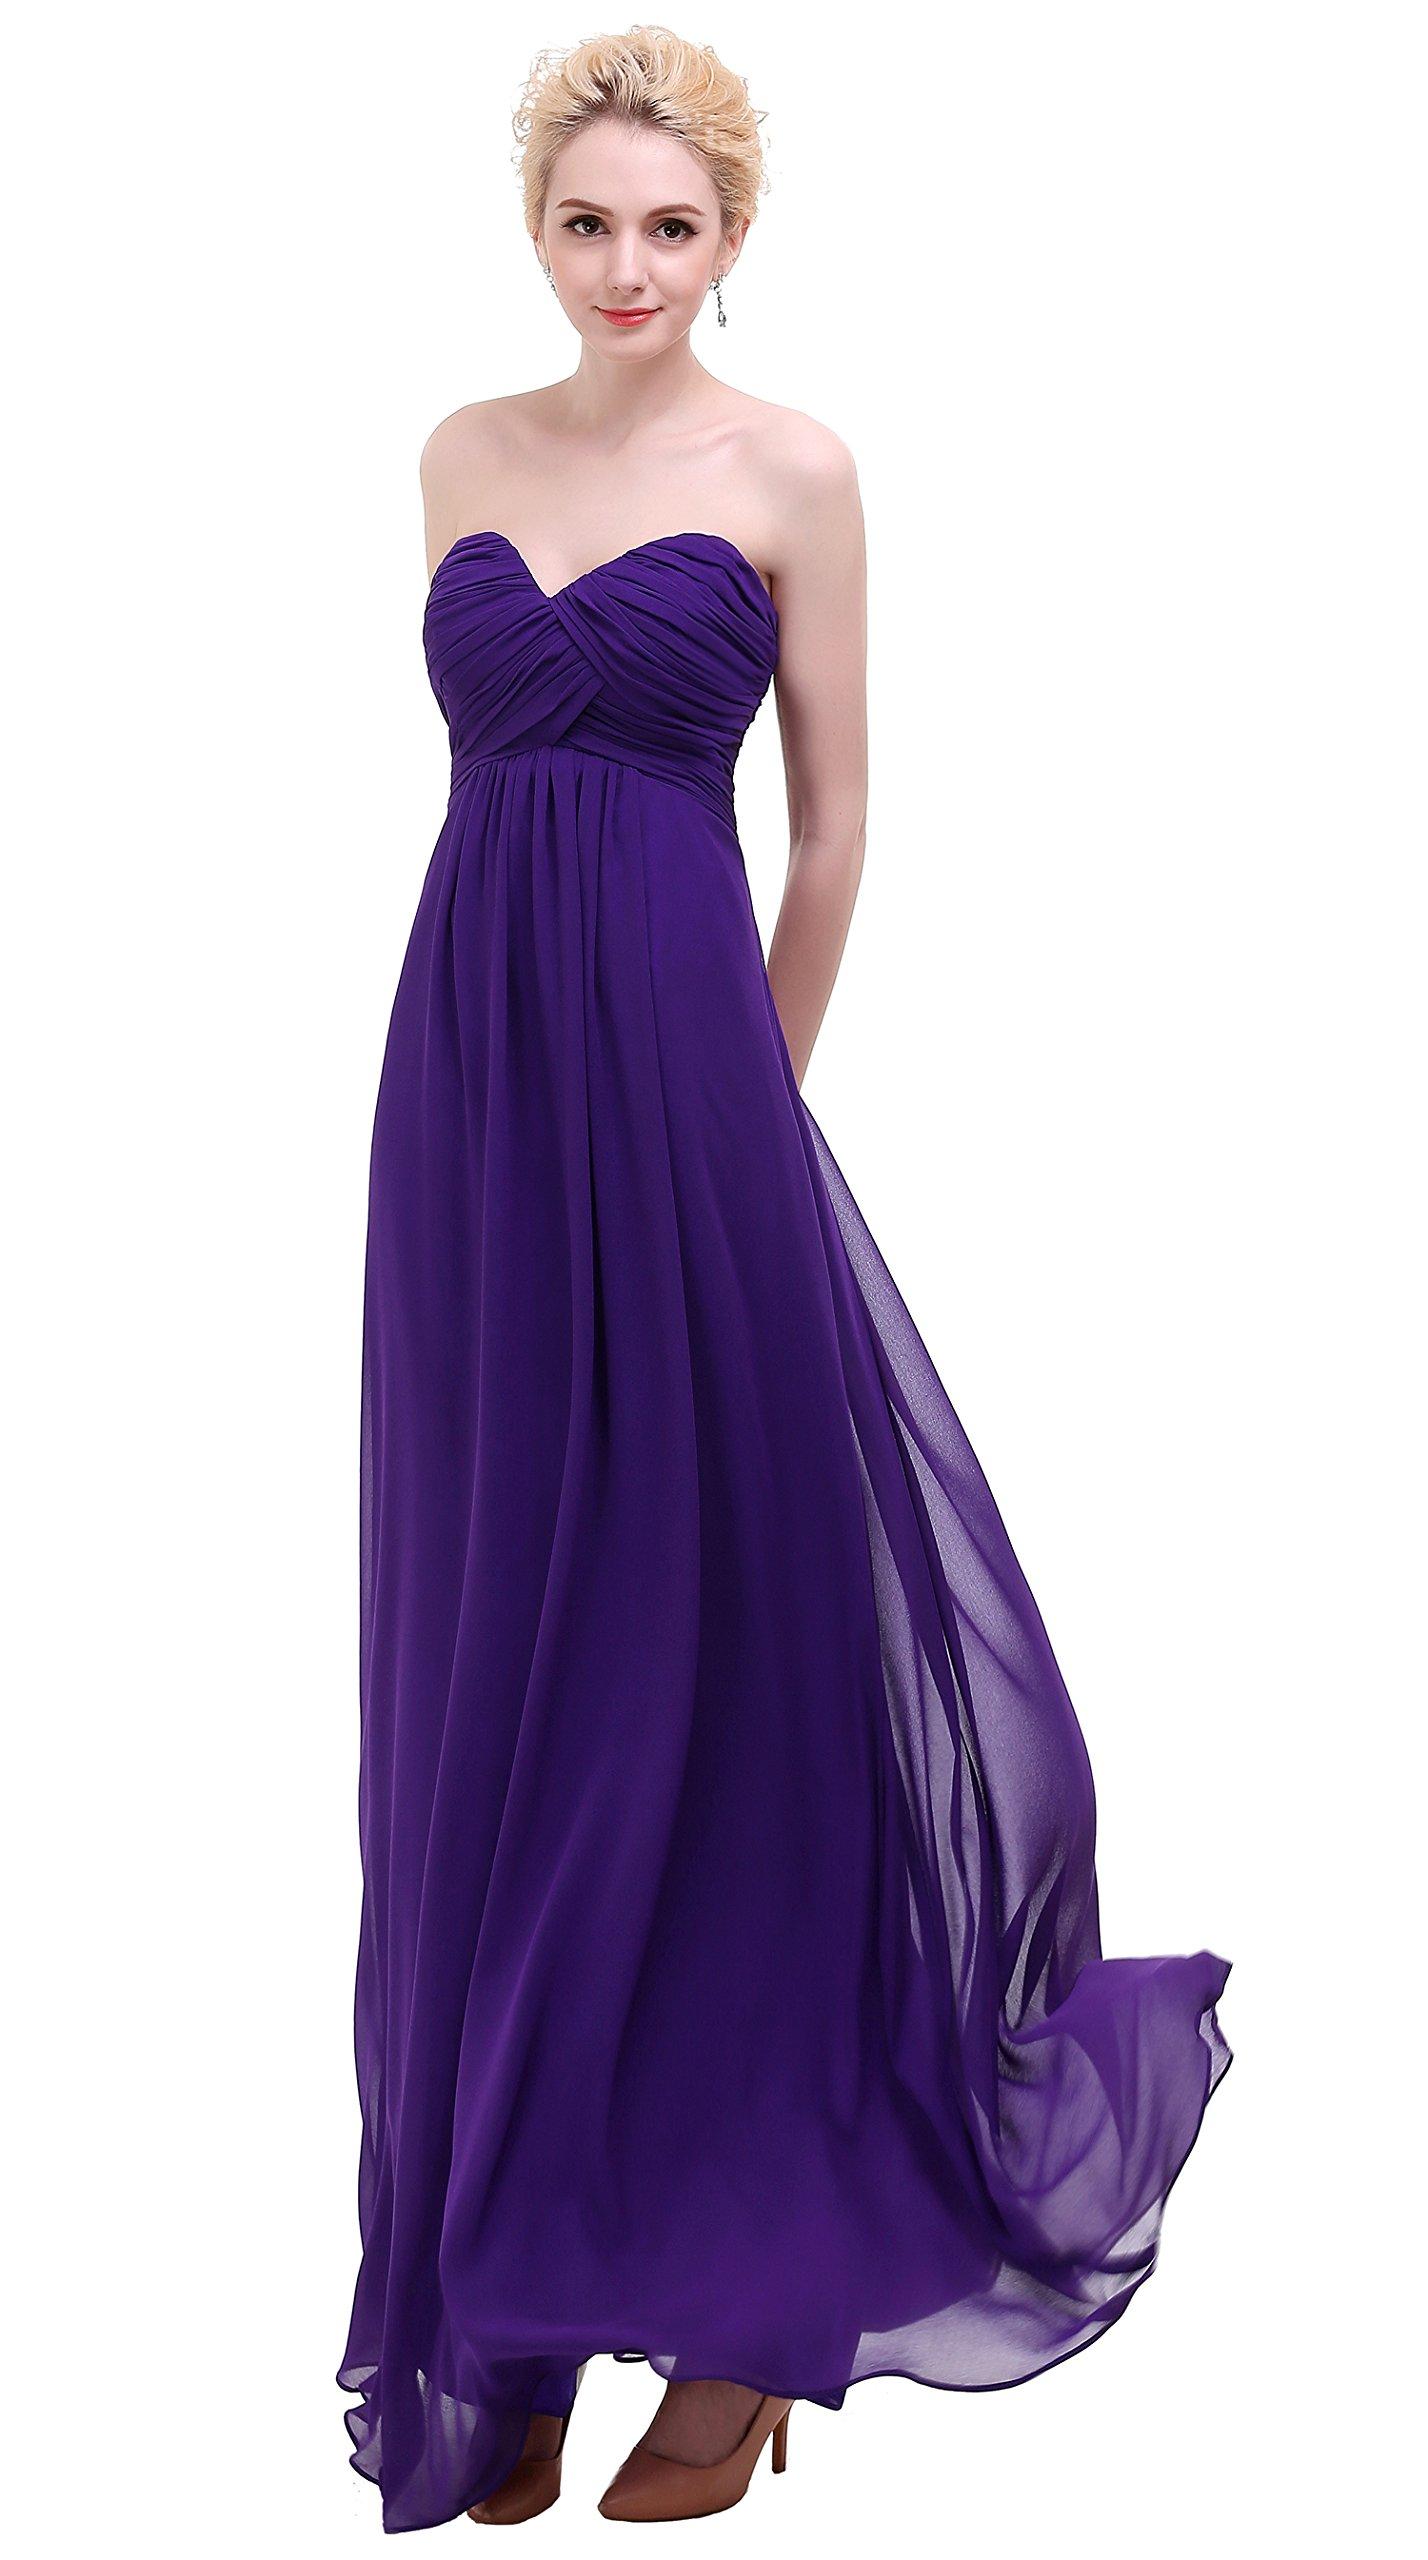 Purple Dark chiffon bridesmaid dresses exclusive photo